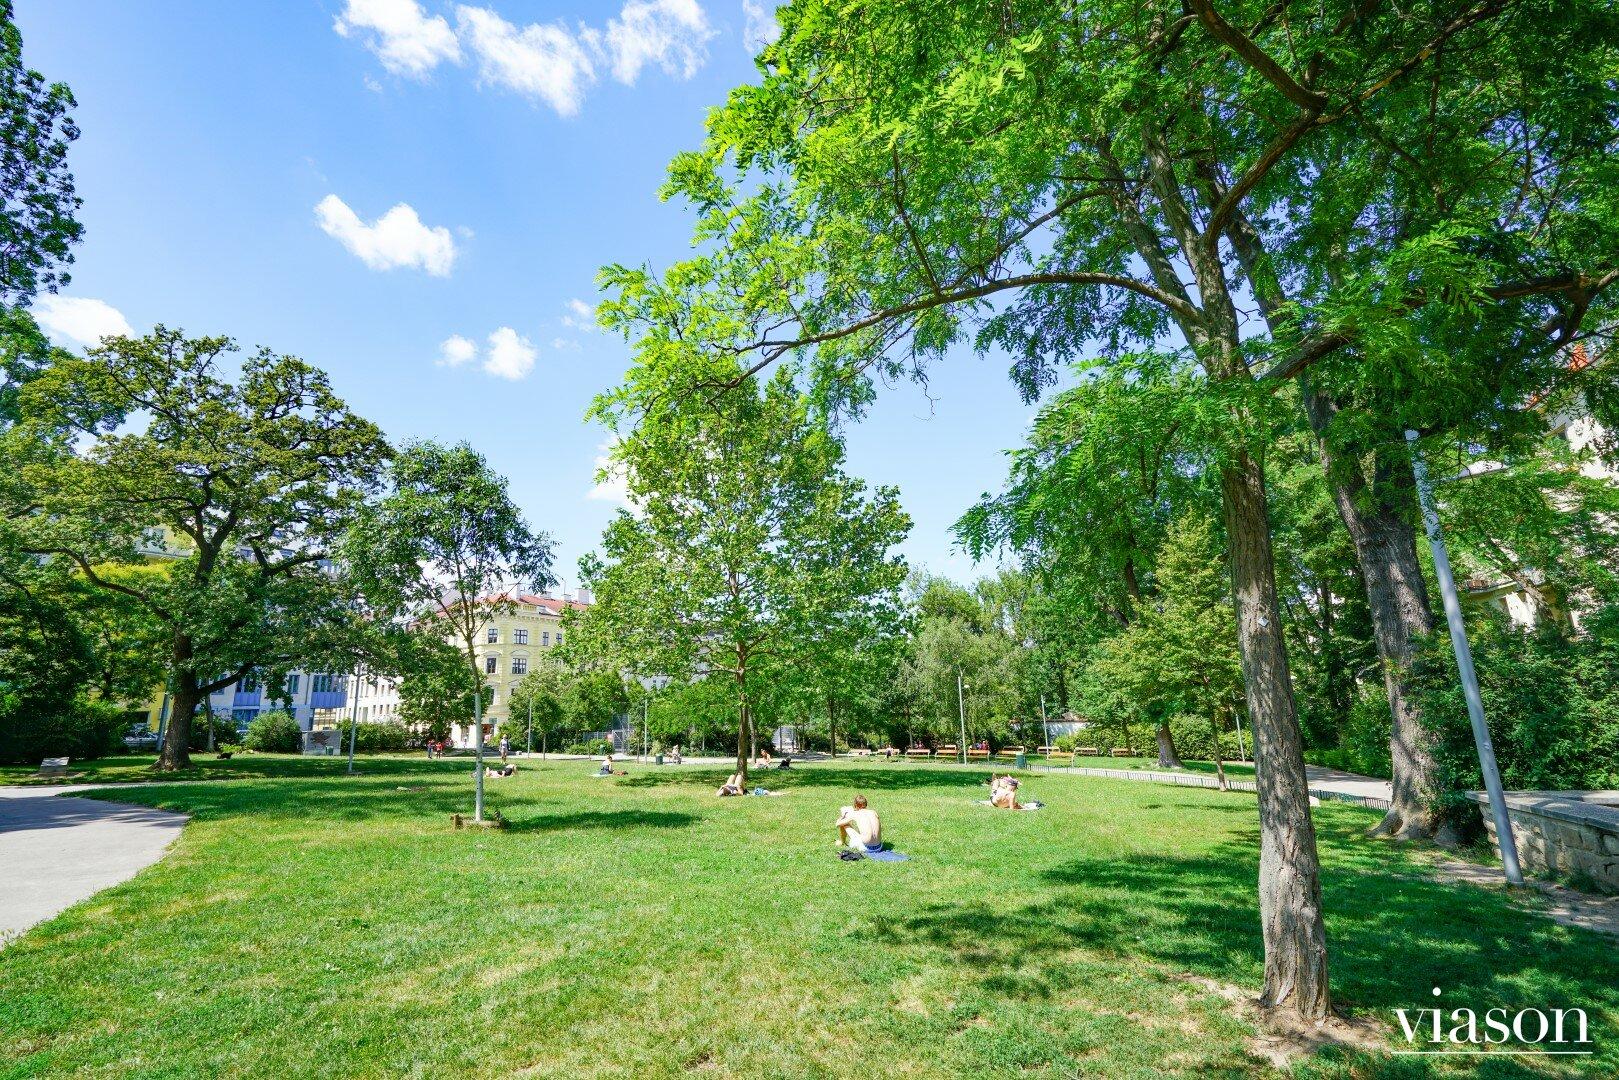 Nahe Schubertpark